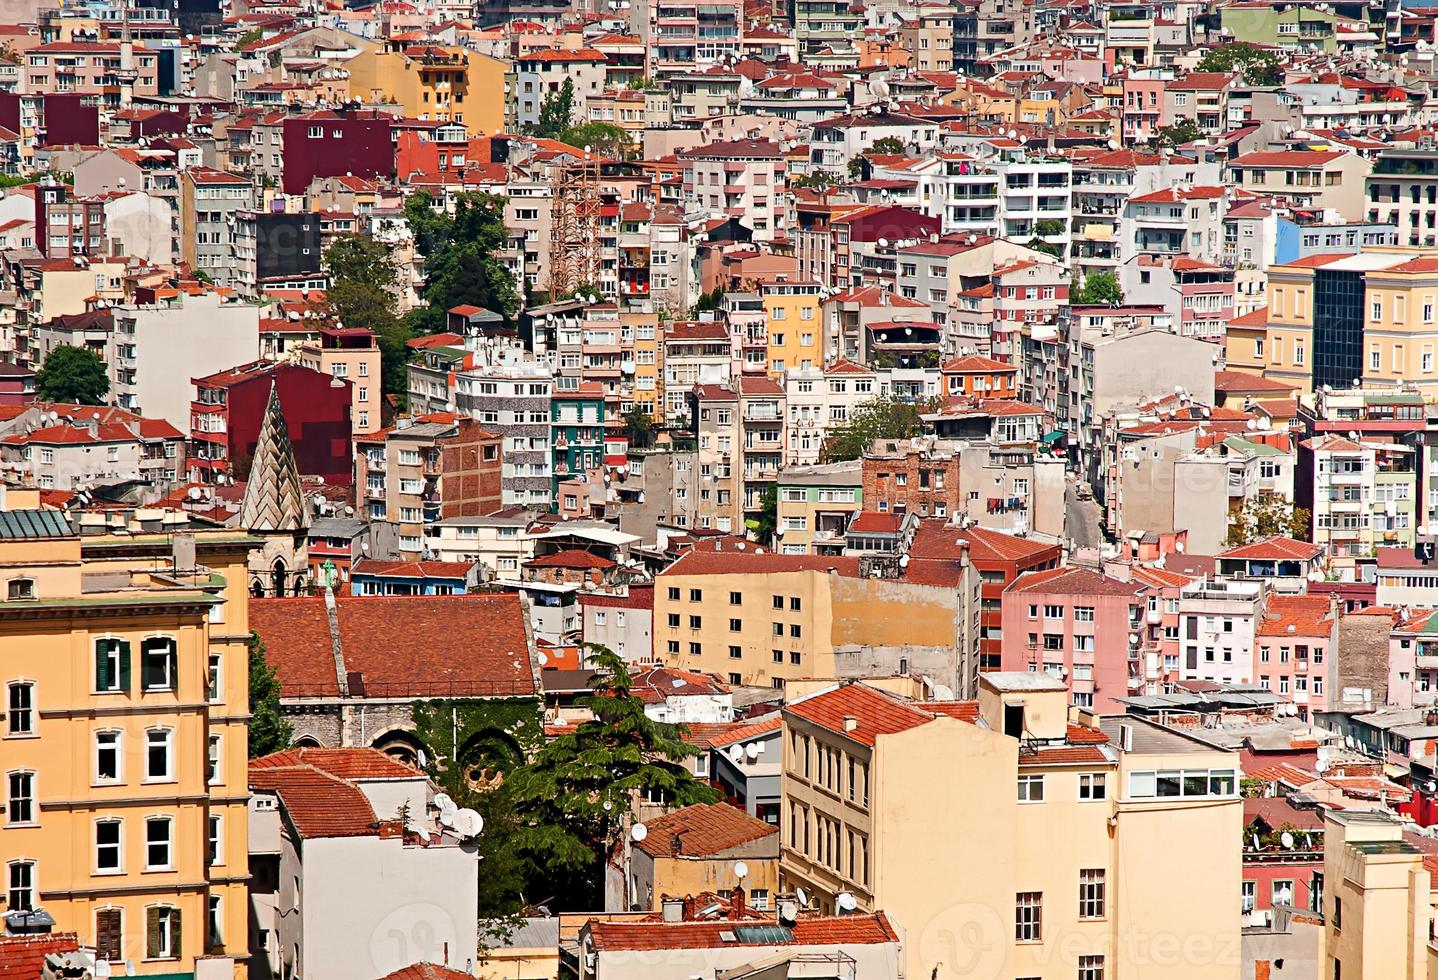 uitzicht vanaf galata toren in istanbul, turkije foto